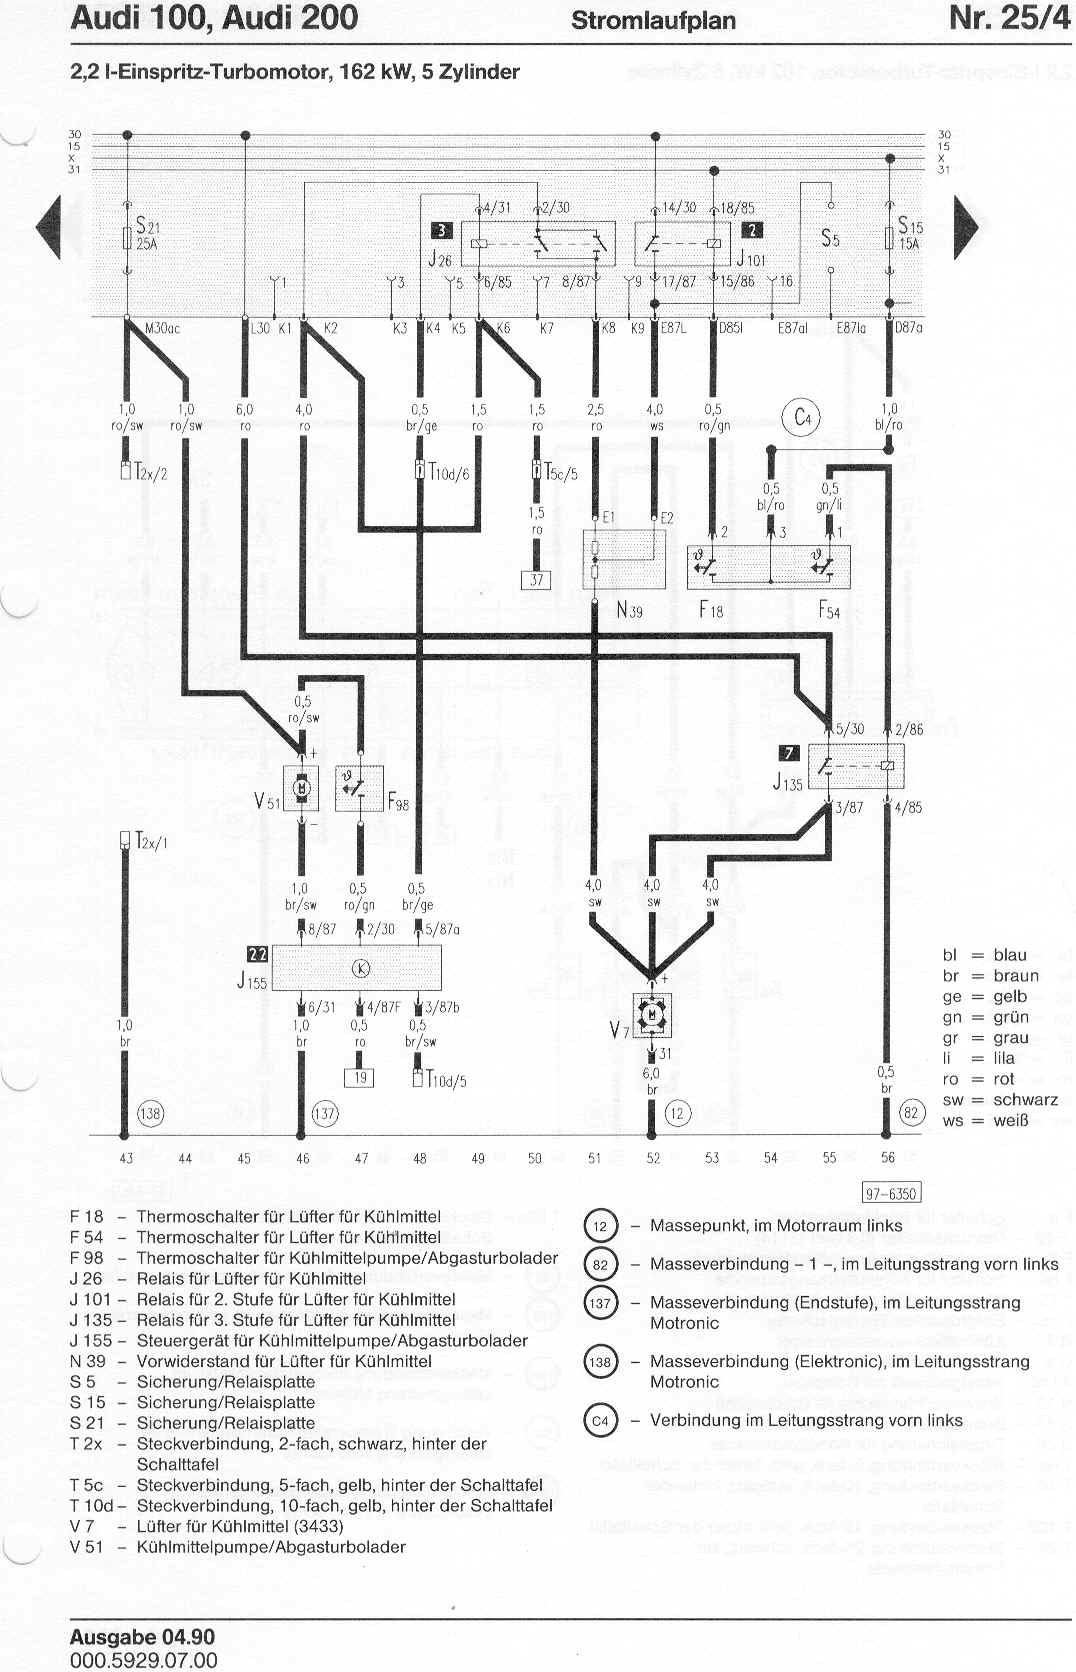 Audi 100/200 Factory Wiring Diagrams